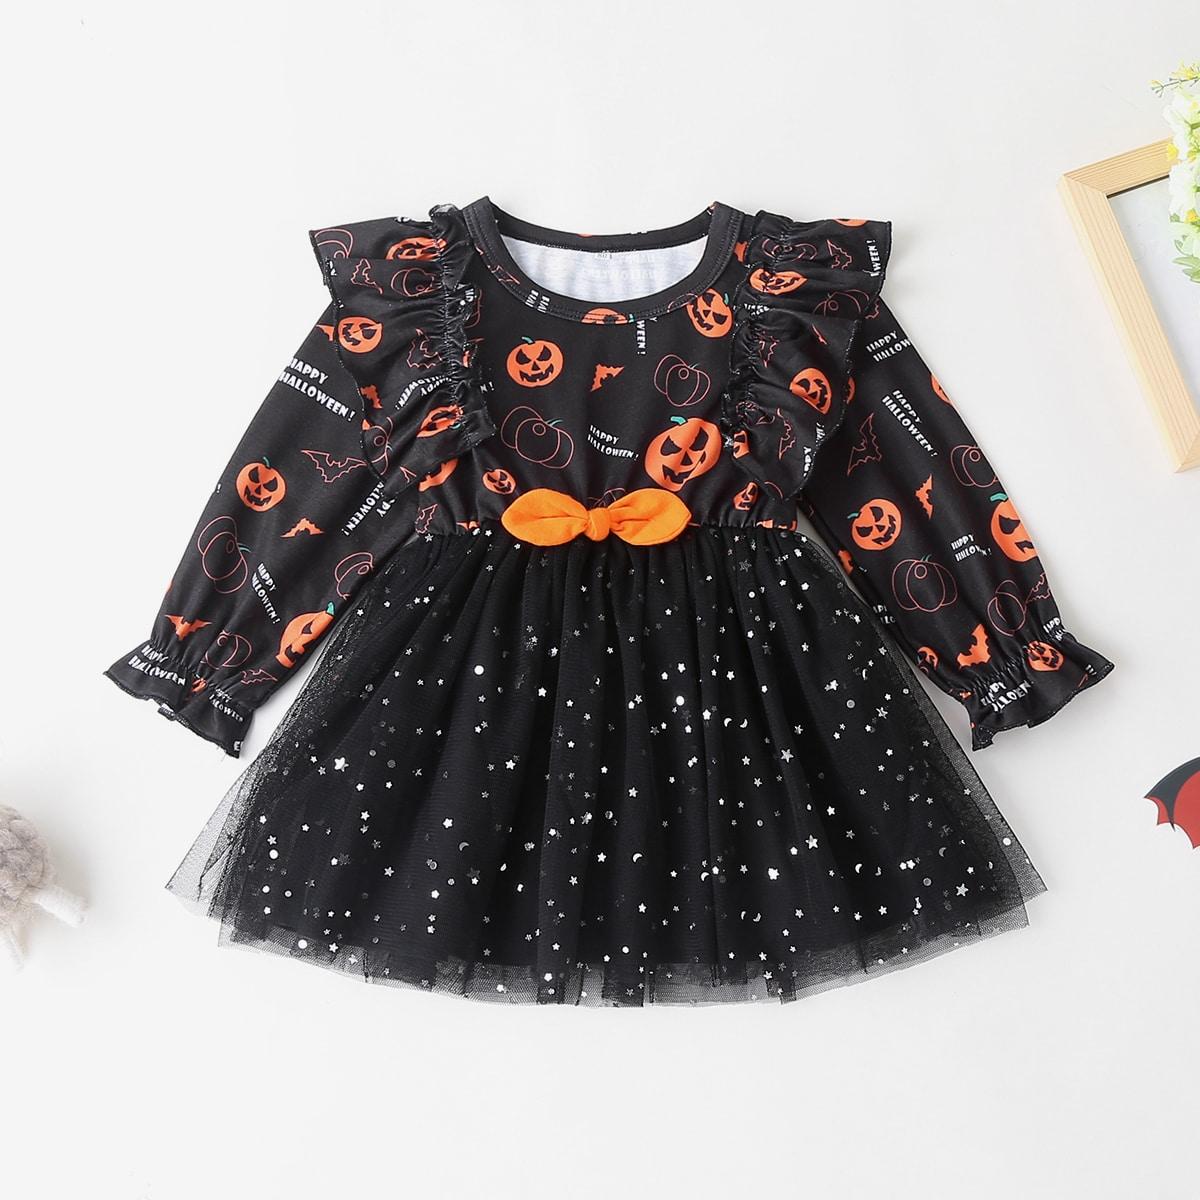 shein Casual Melkweg Baby-jurk Rimpeling